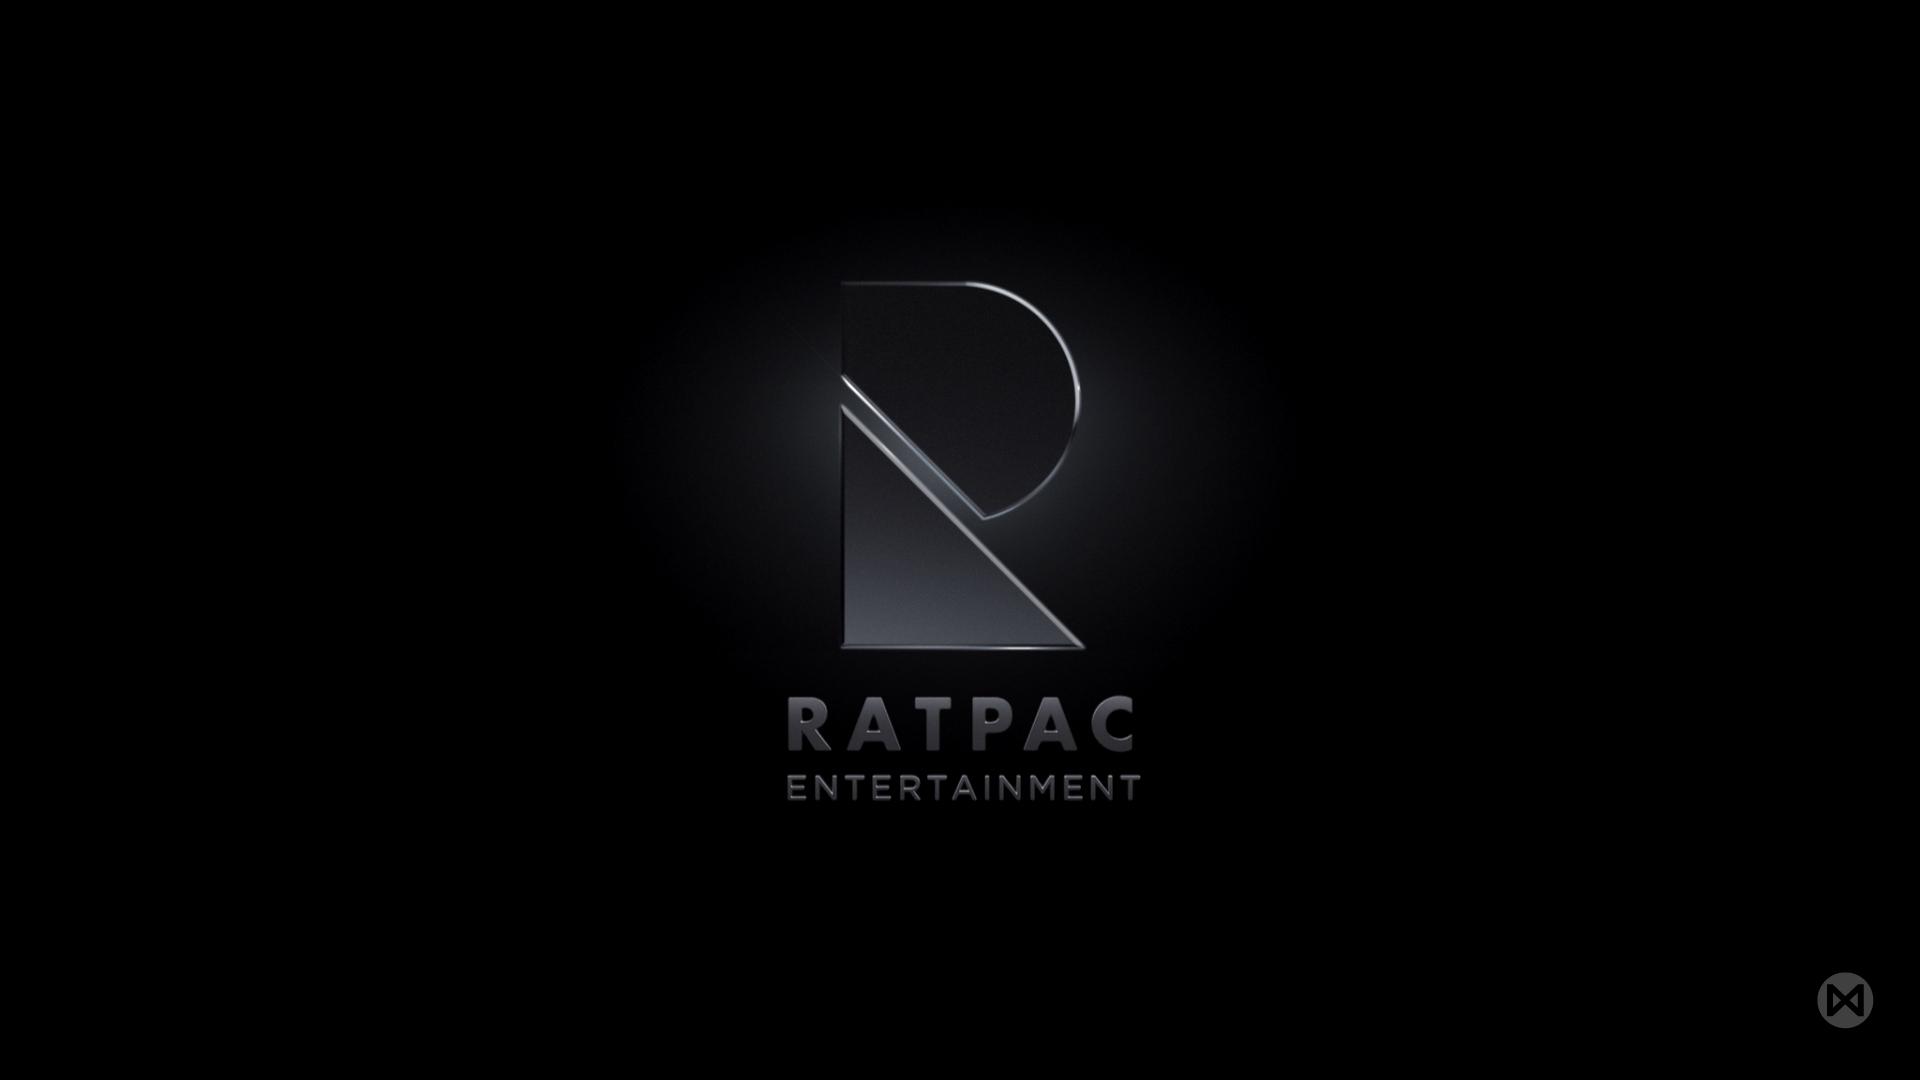 DarkMatter_Ratpac_Logo-16.jpg